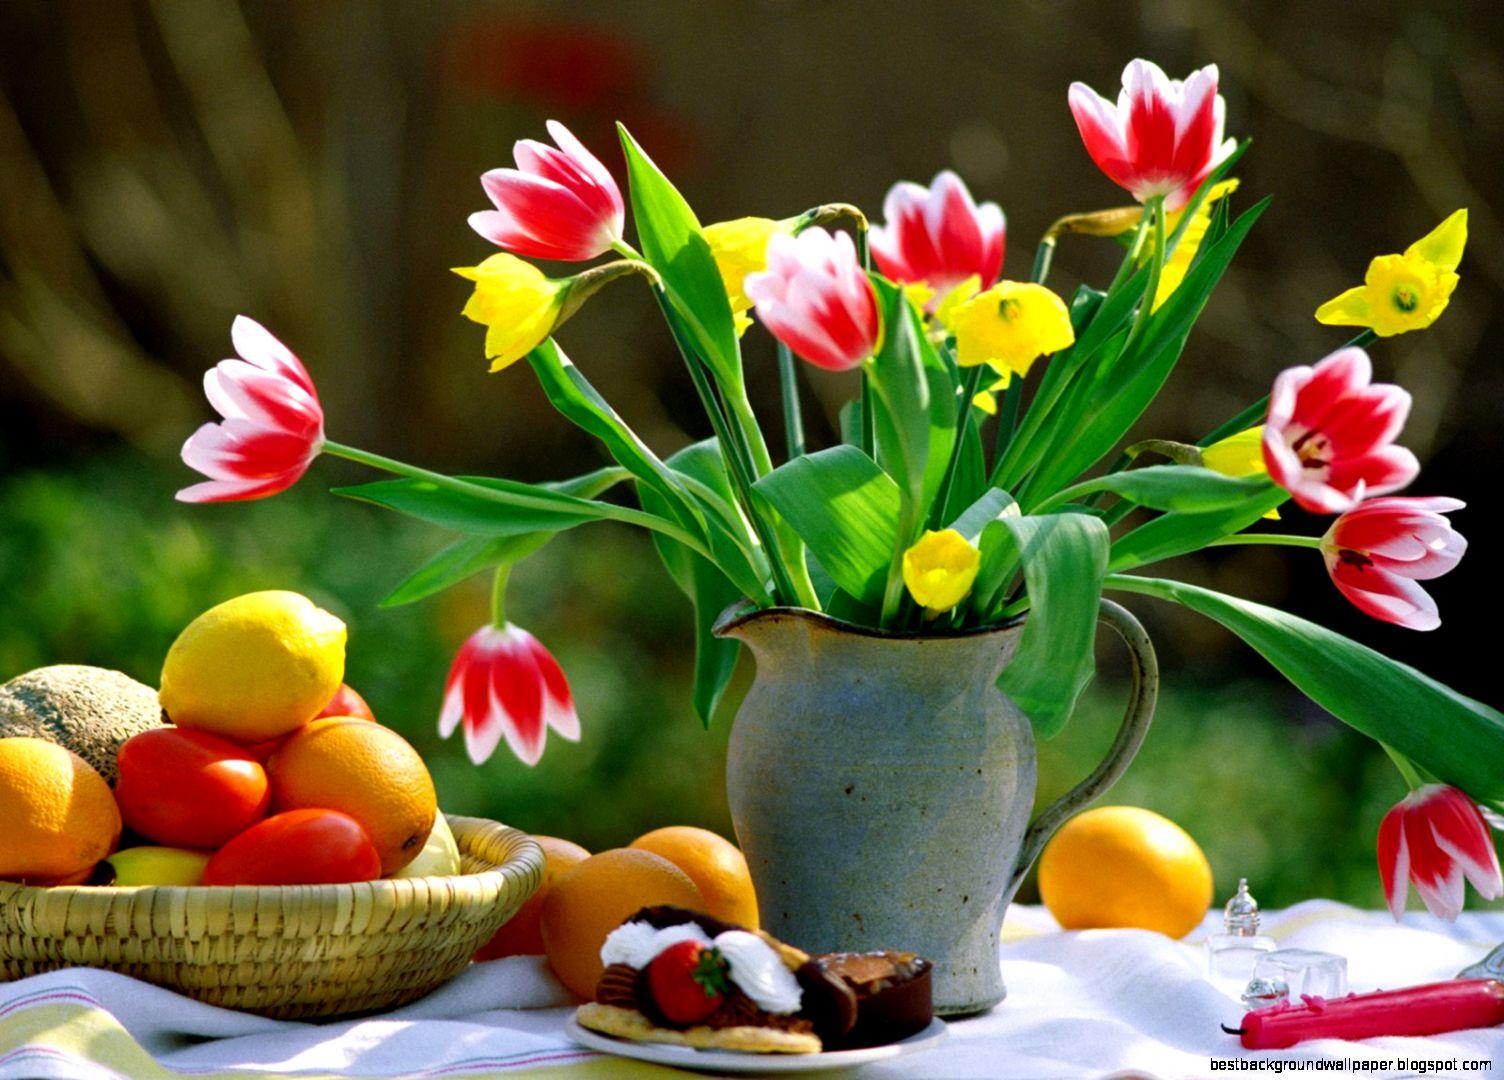 Spring Flower Screensavers Downloads Best Background Wallpaper